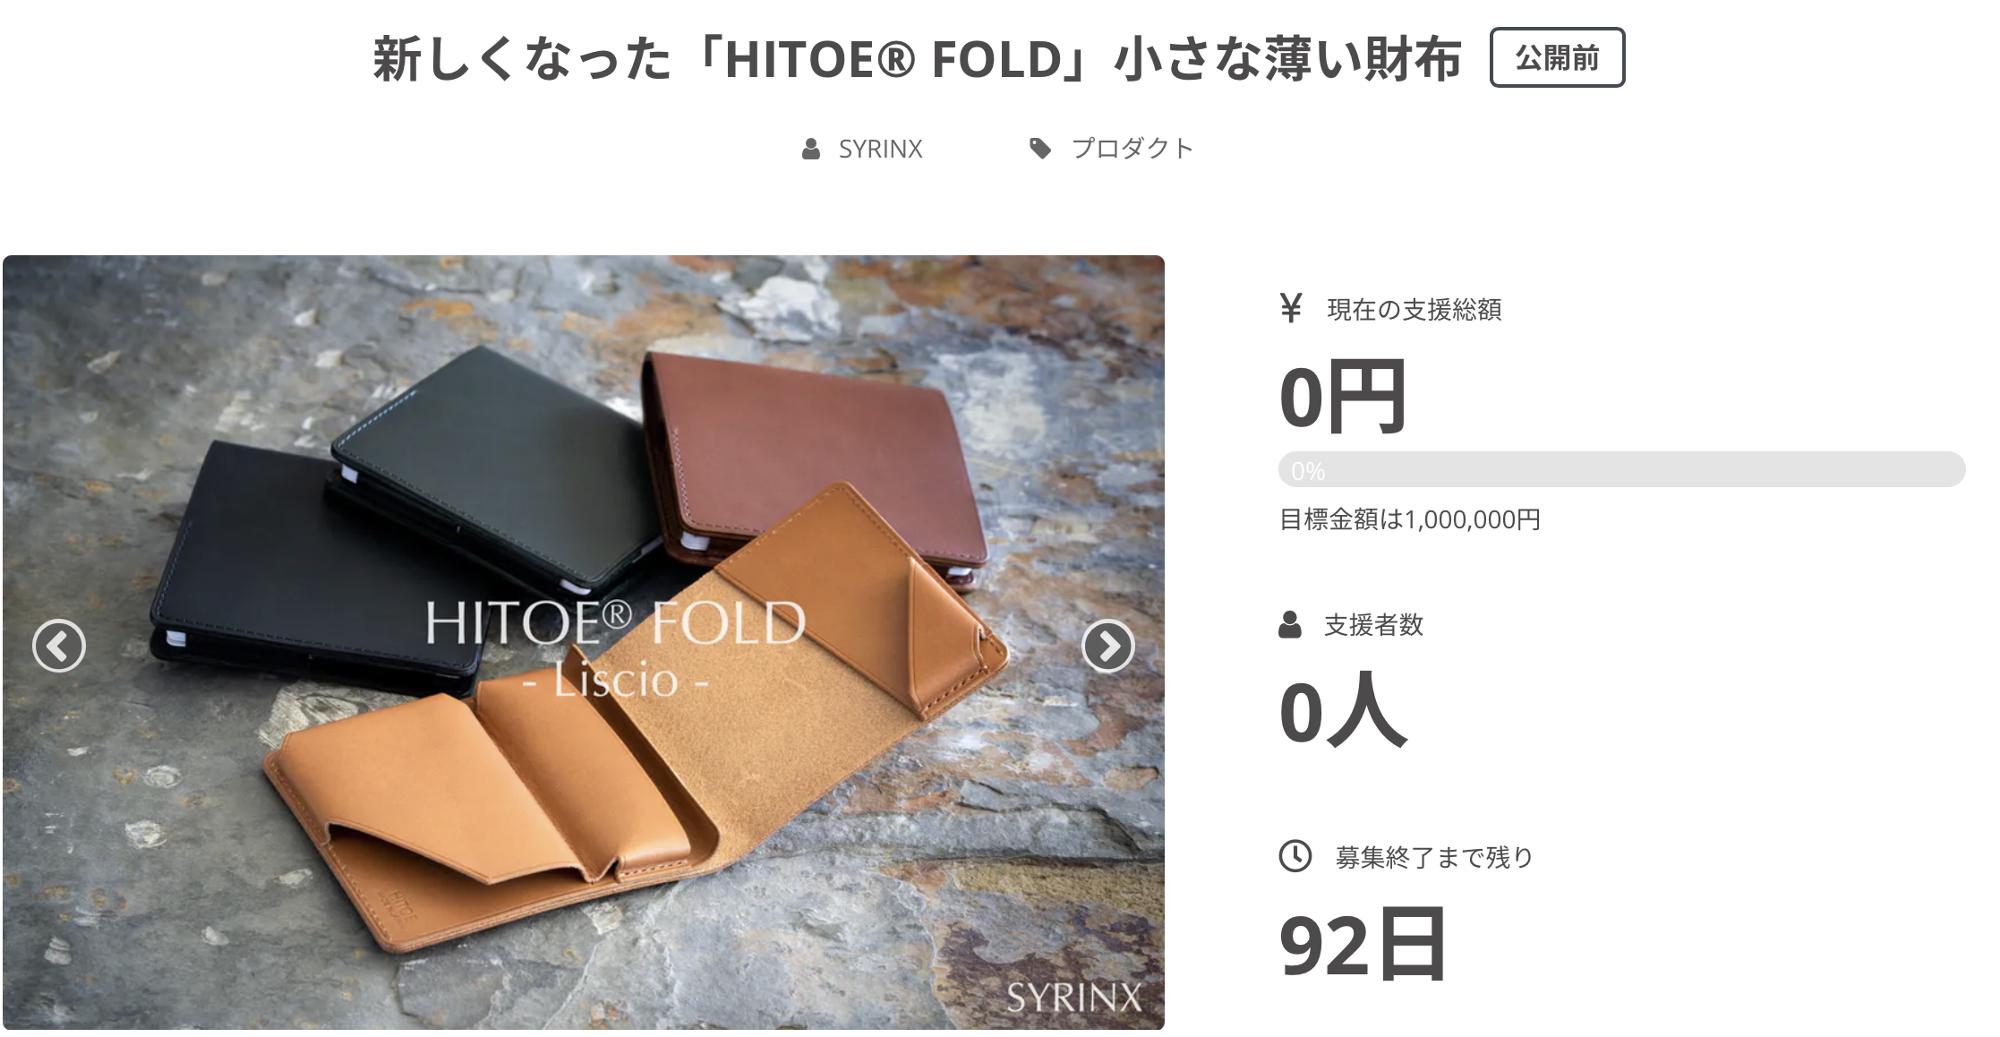 HITOE Fold-Lischio-